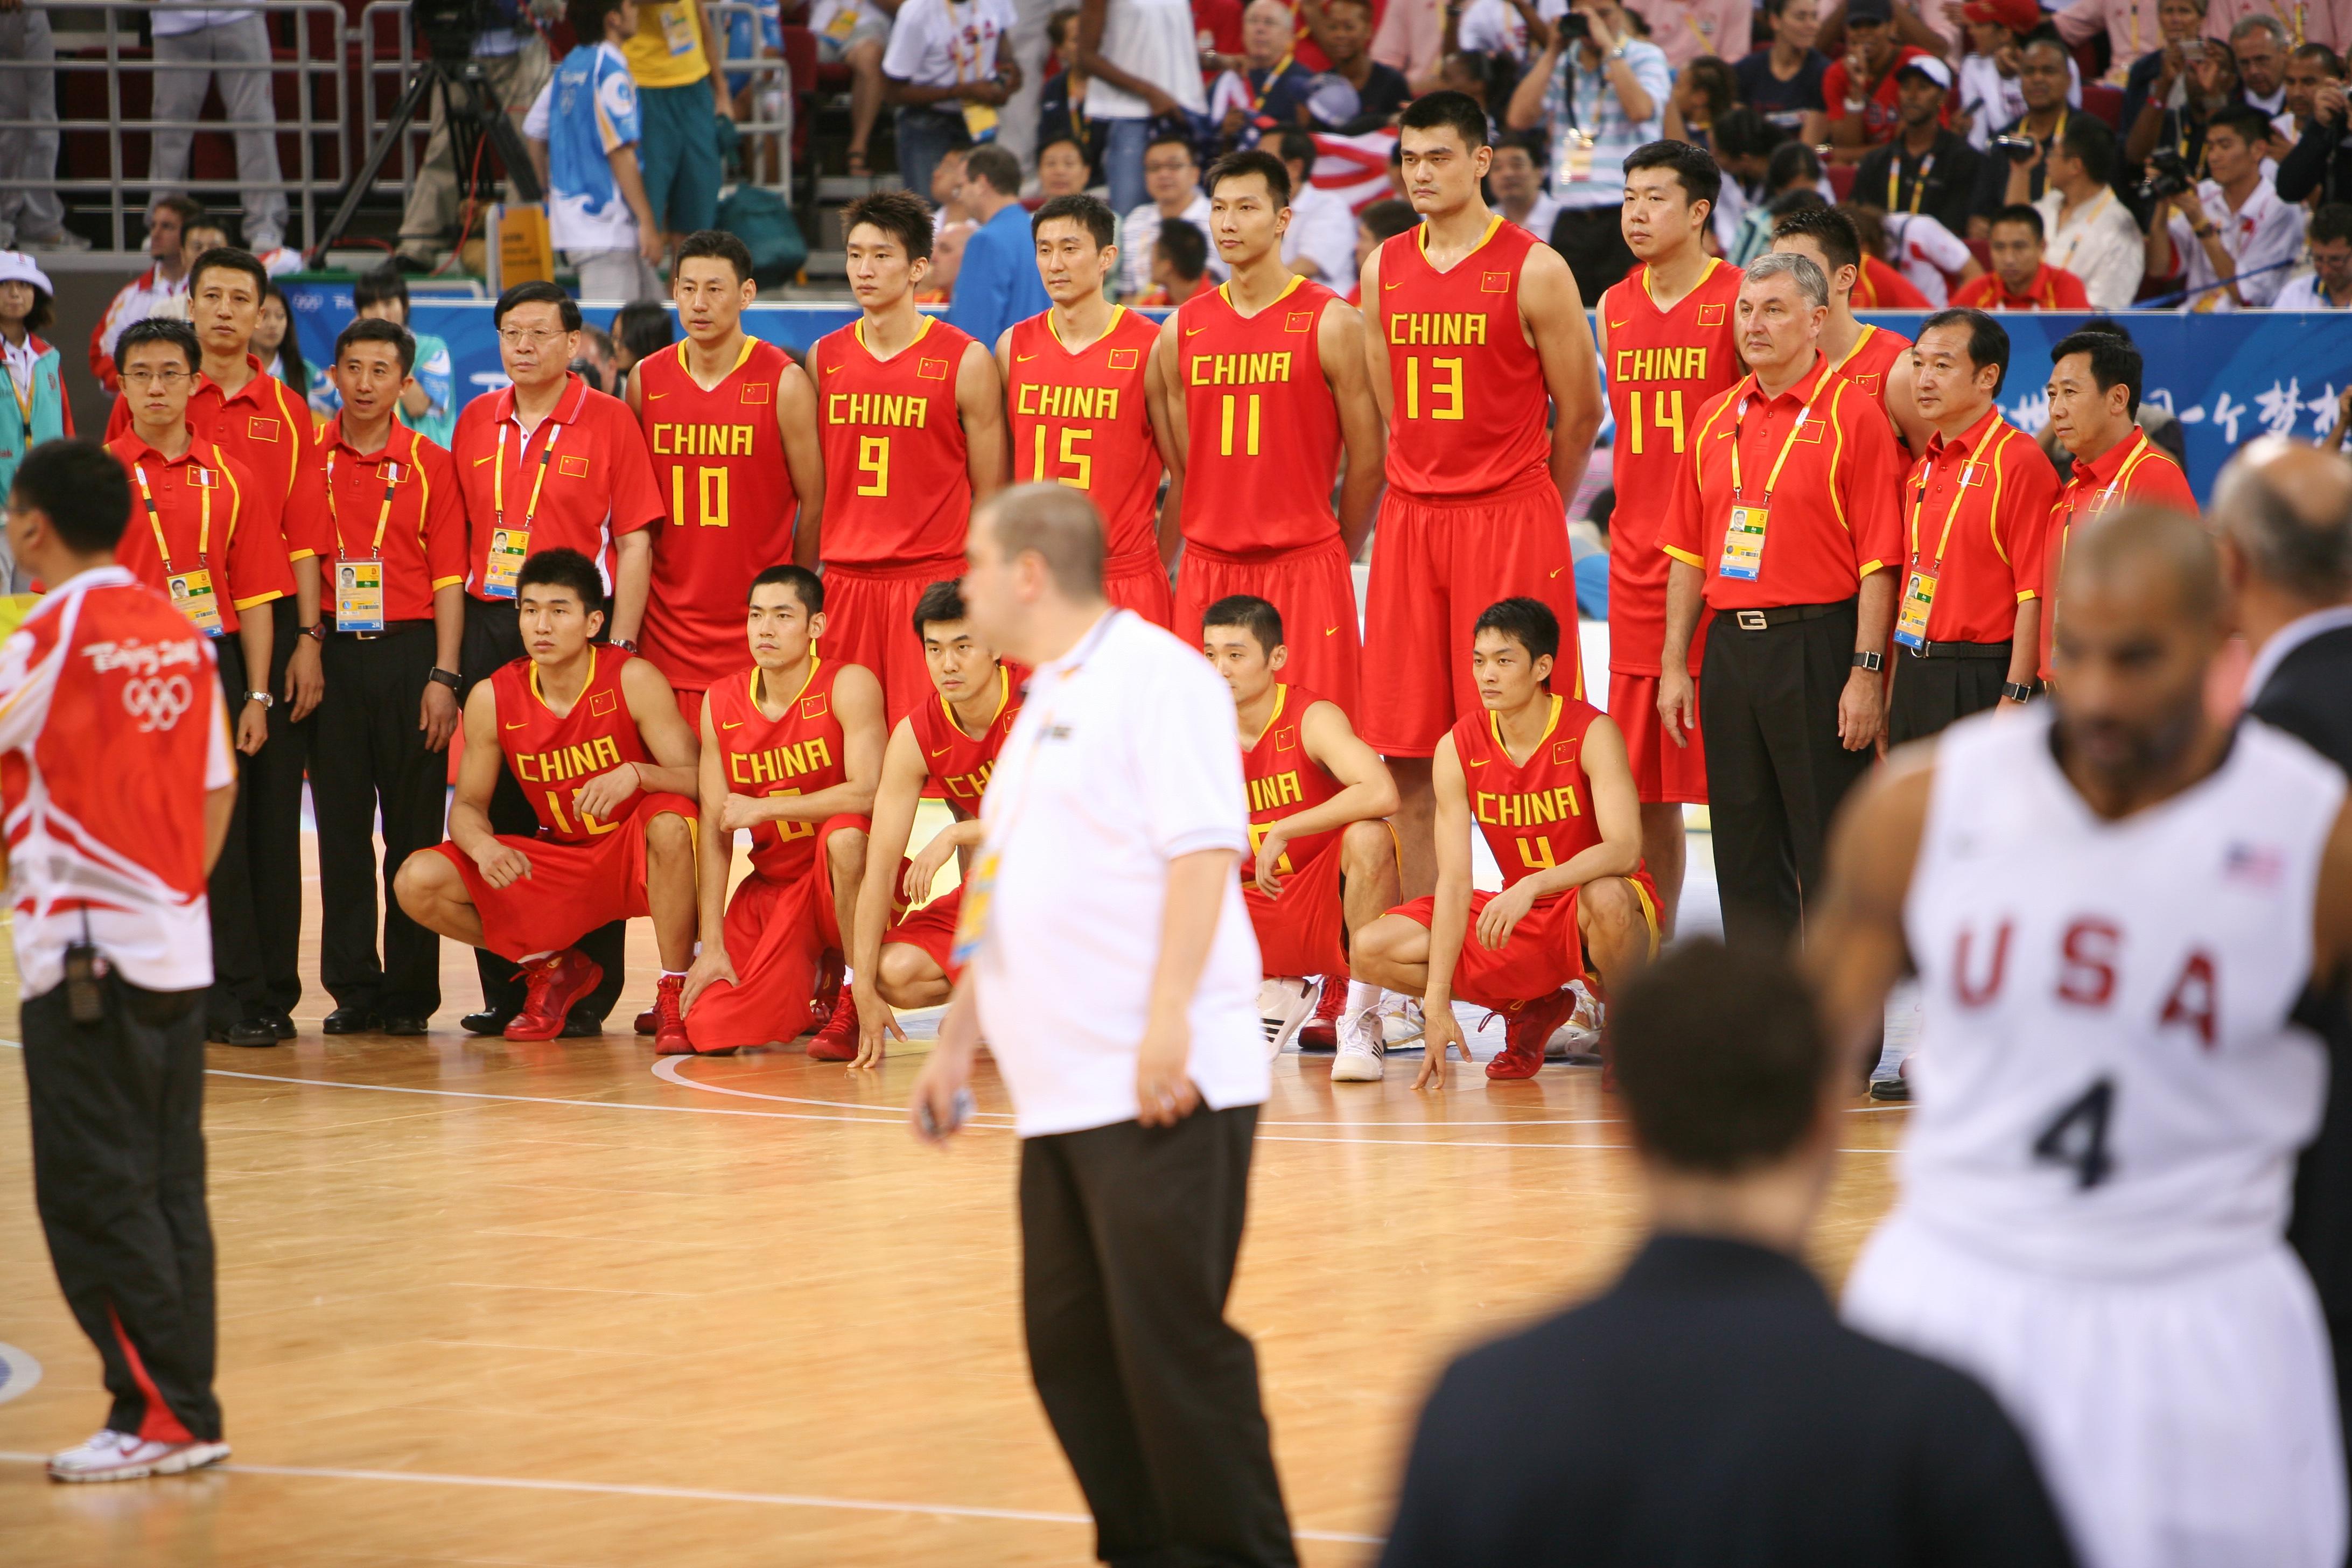 China men's national basketball team - Wikiwand